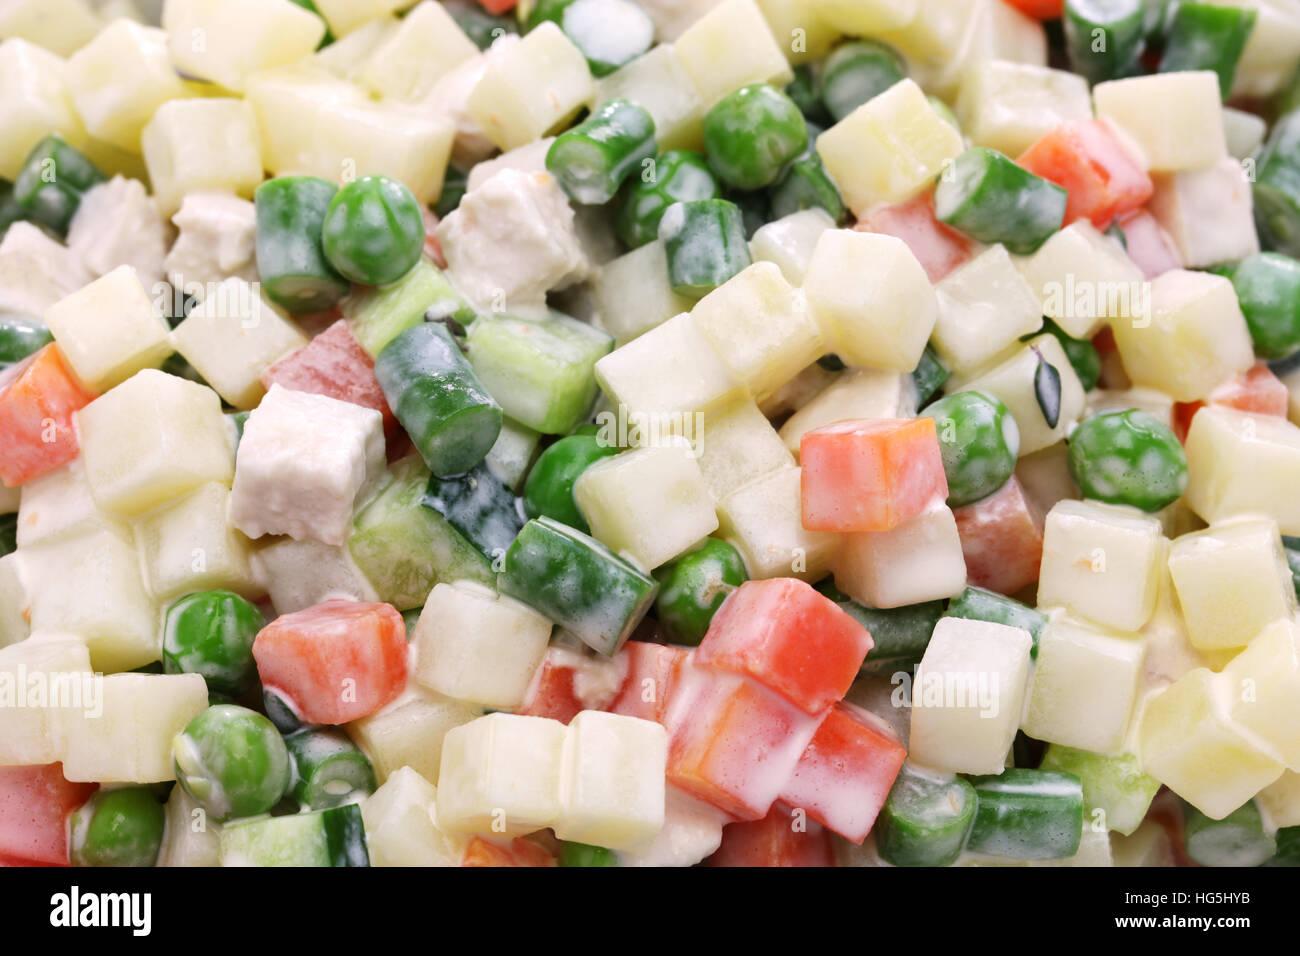 macedonia salad, macedoine de legumes, mixed vegetable salad, french cuisine - Stock Image